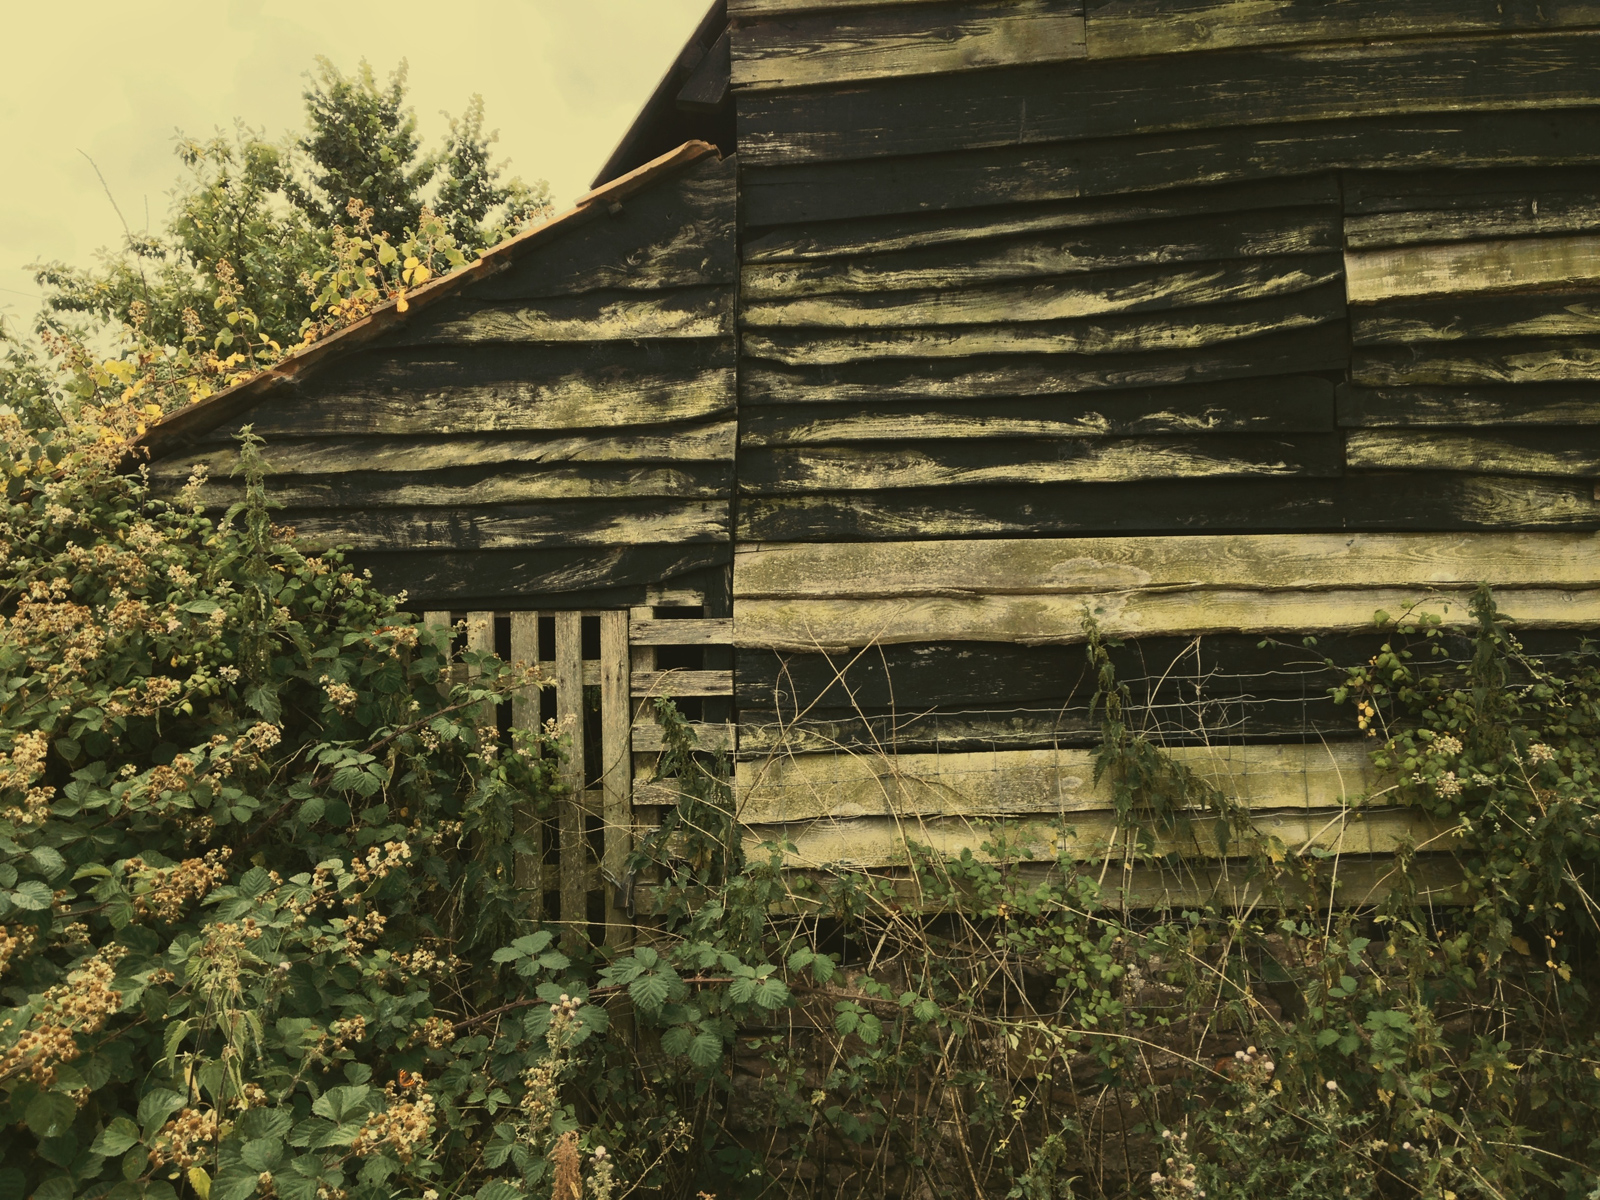 ciderhouse4.jpg